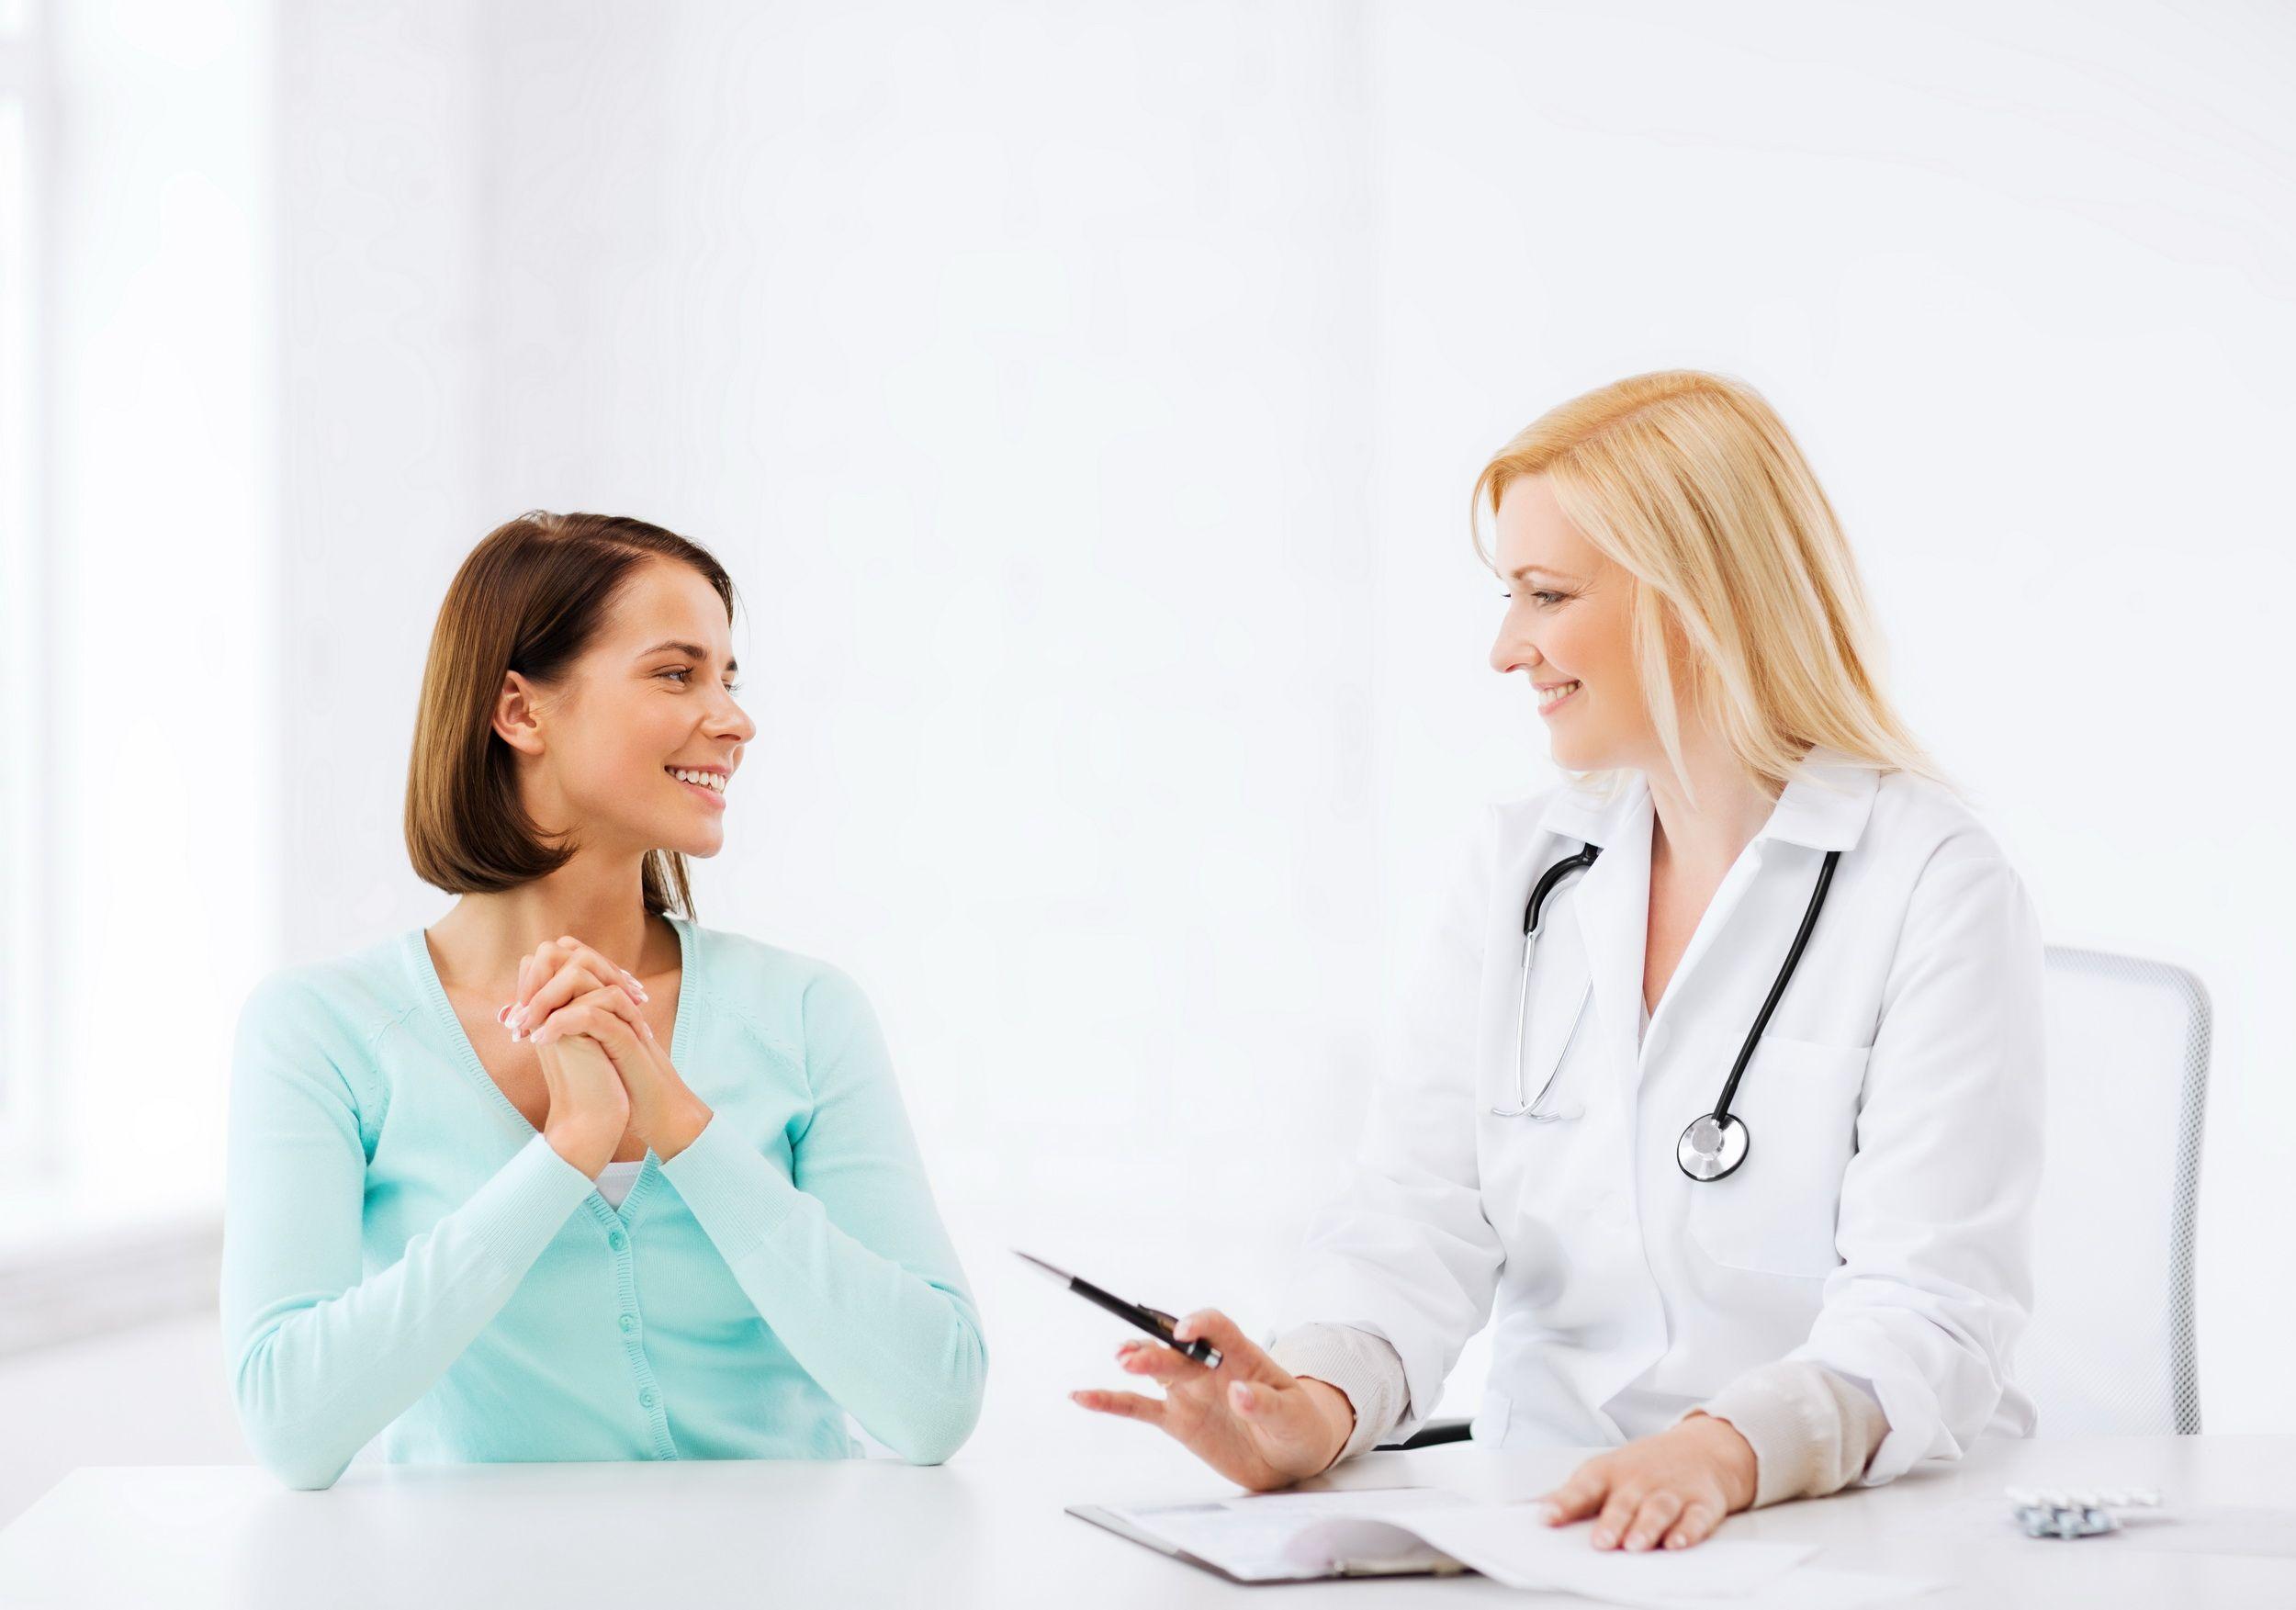 консультация врача-маммолога